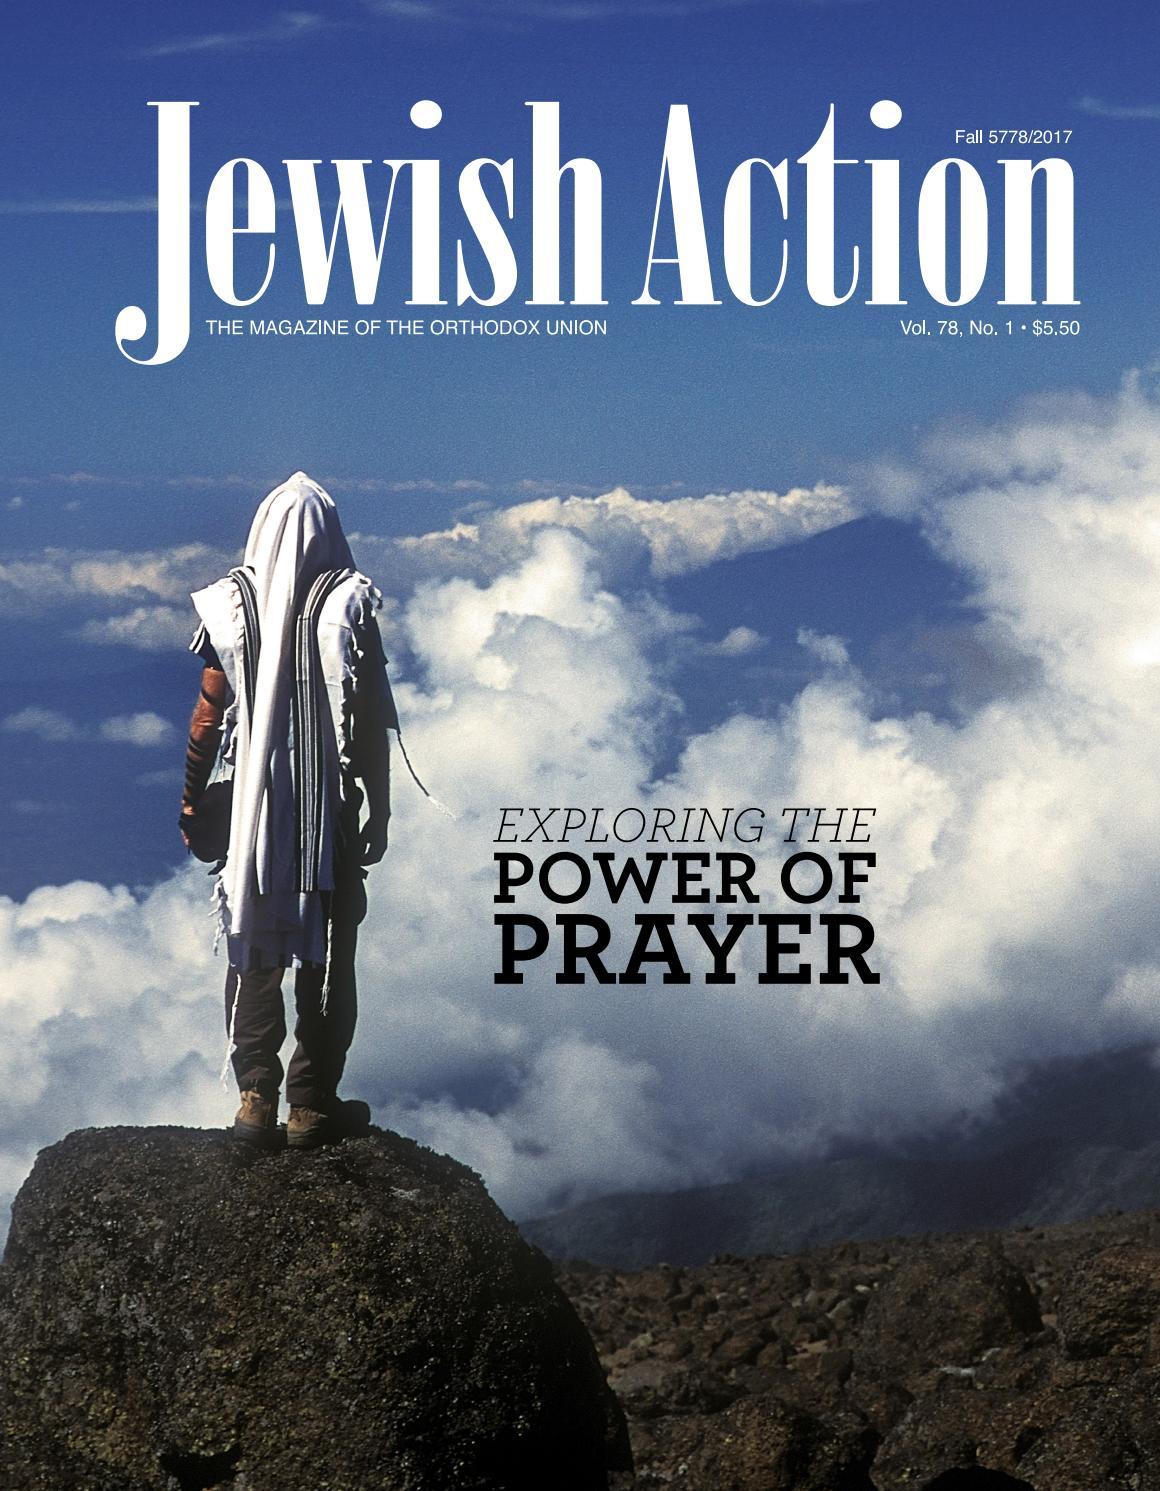 Jewish Action Fall 2017 By Orthodox Union Issuu